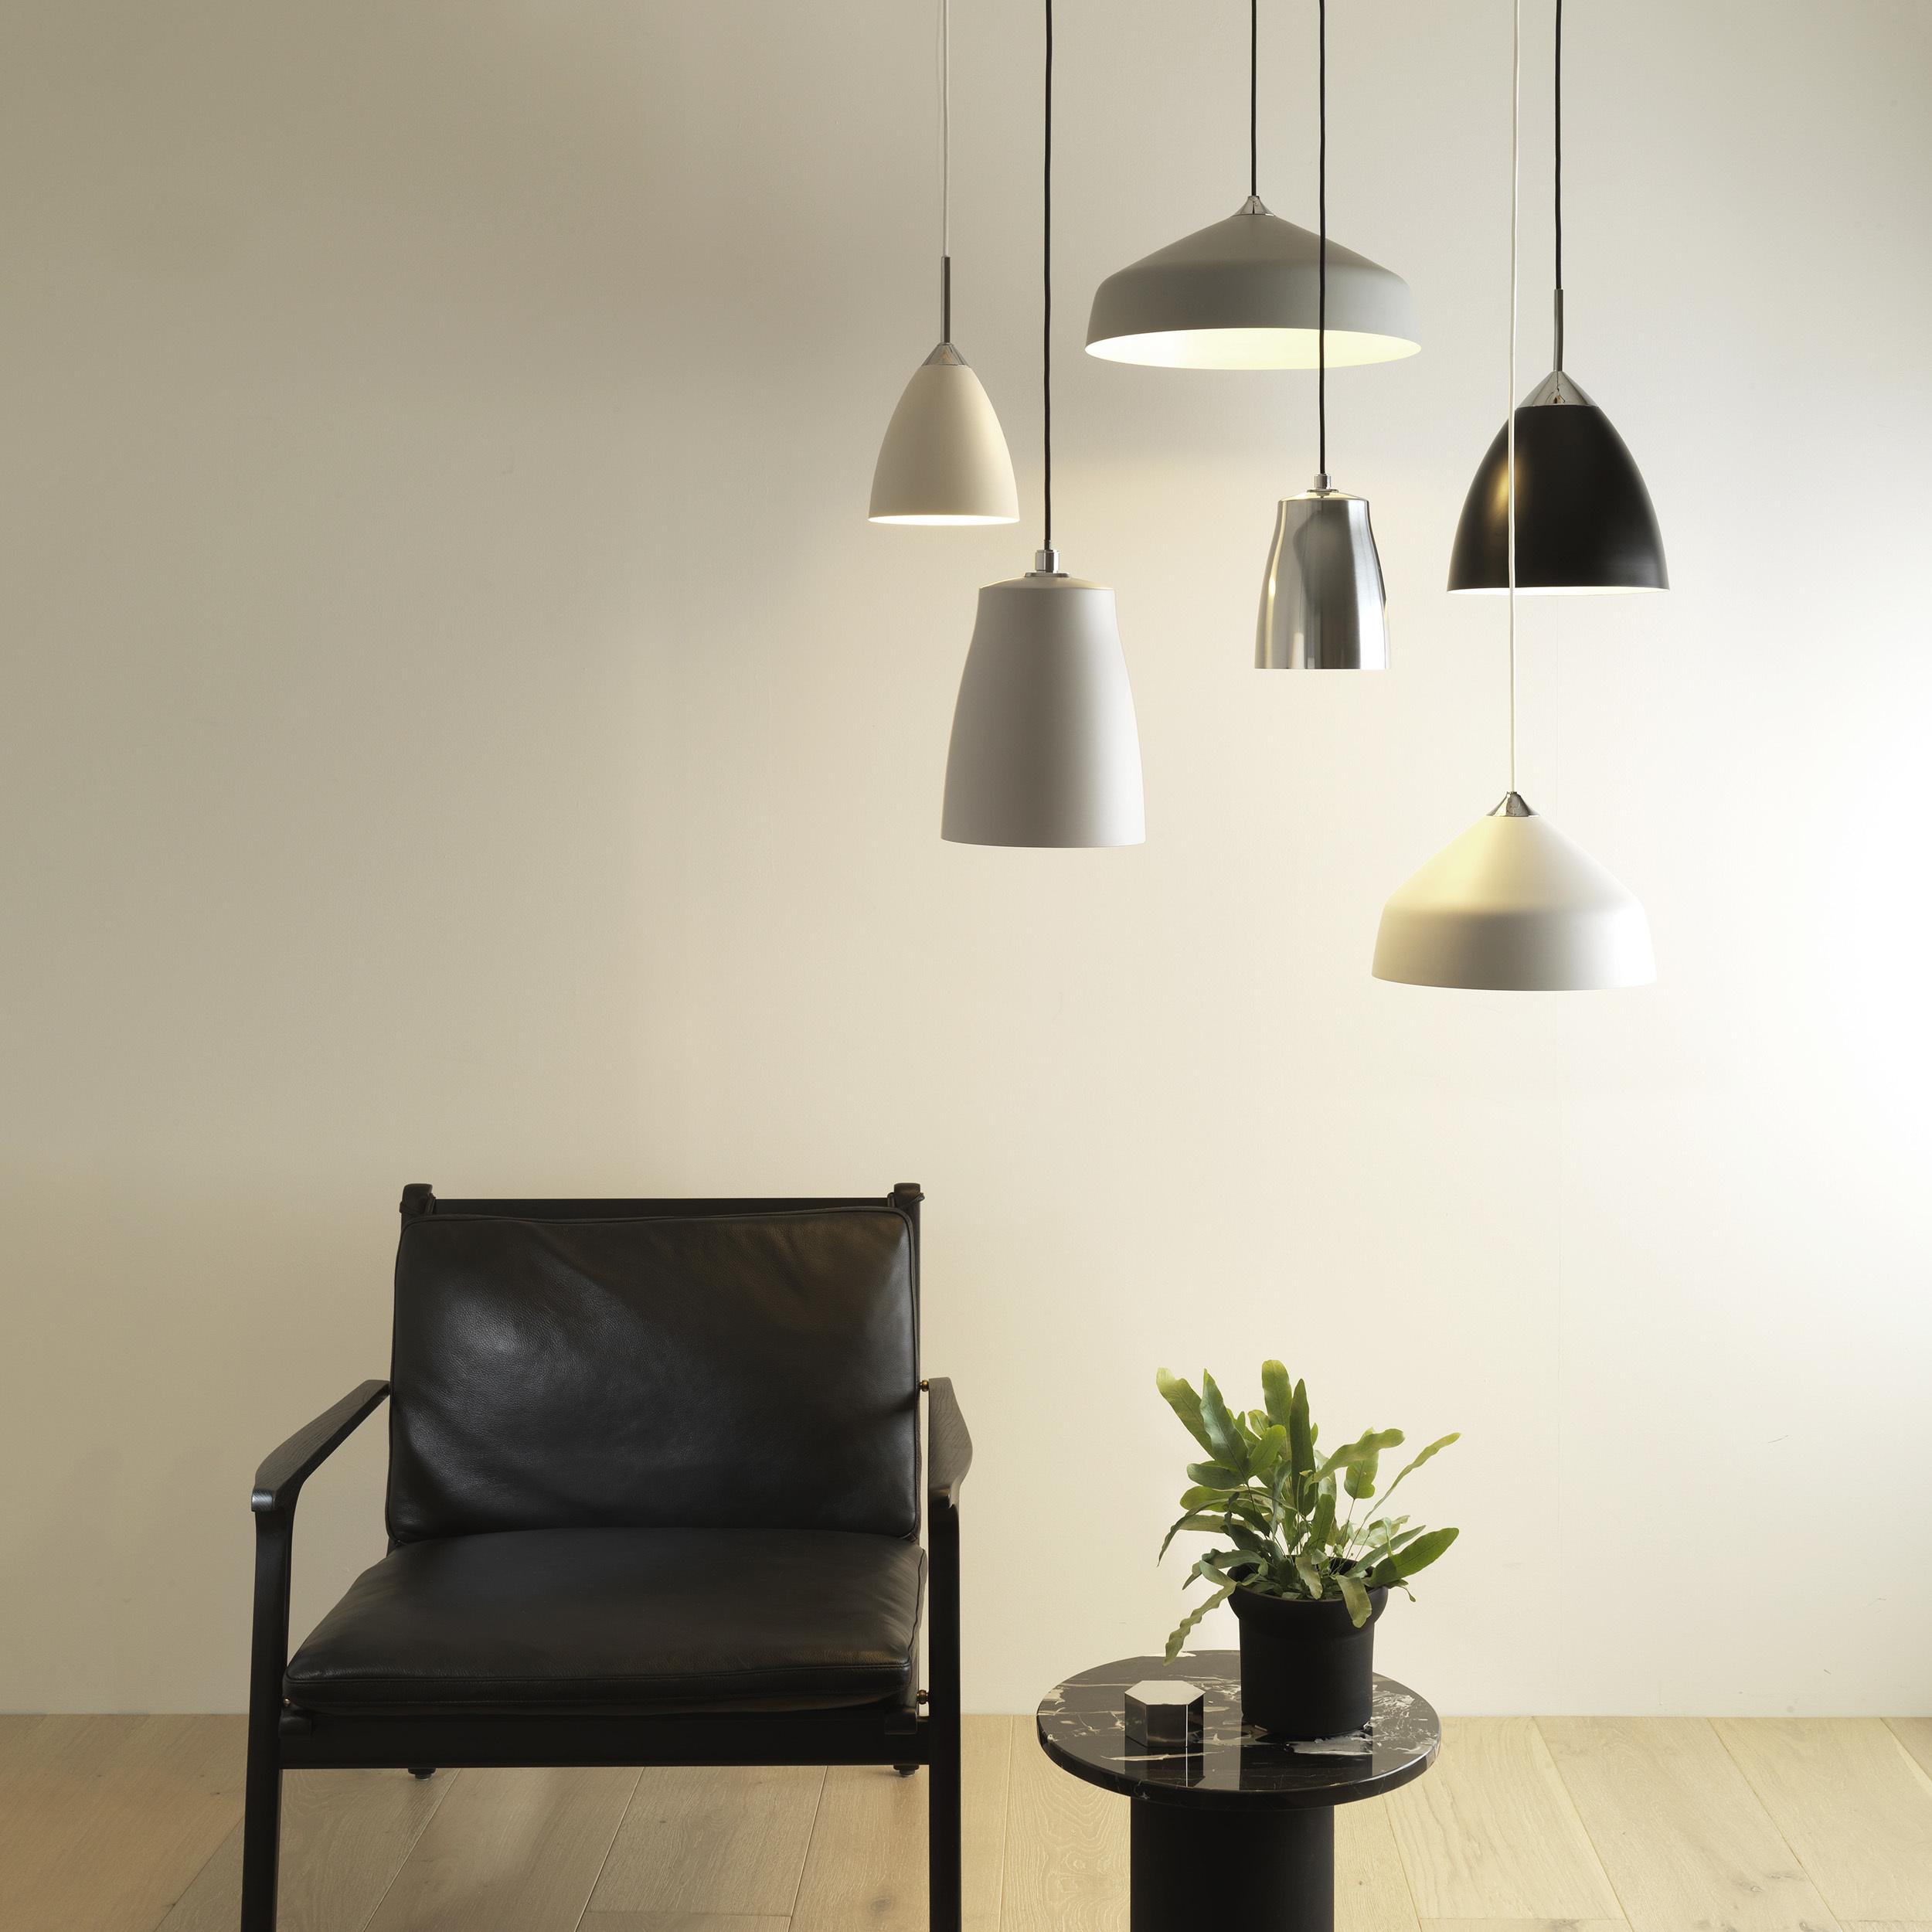 Подвесной светильник Astro Atelier 1224017 (7513), 1xE27x42W, алюминий, металл - фото 3